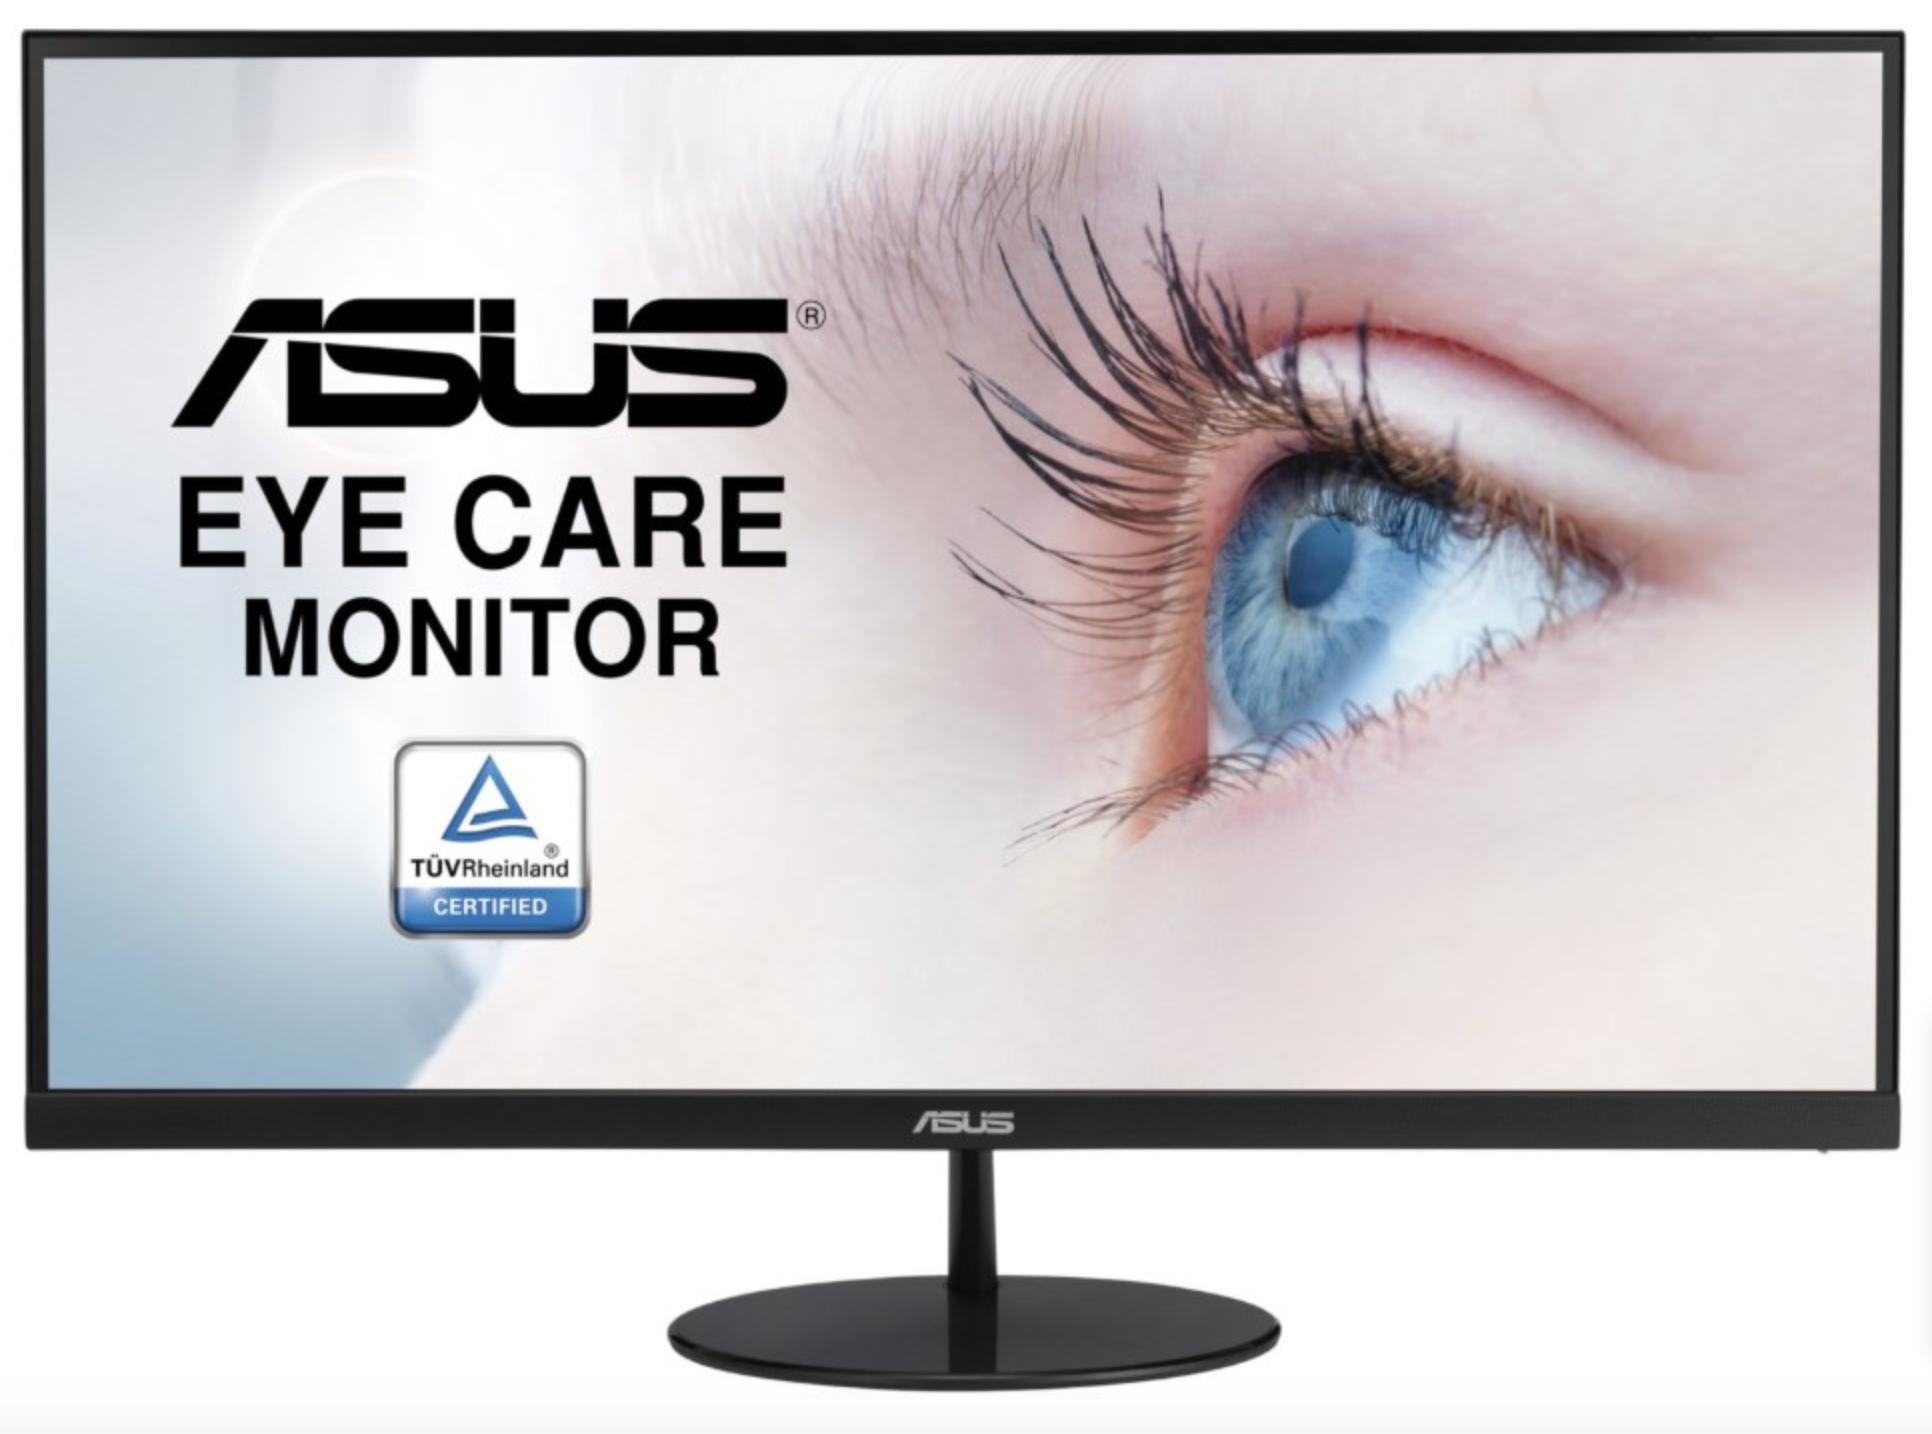 Asus VL279HE 68,6 cm (27 Zoll) EyeCare Monitor (Full HD, IPS, 5ms Reaktionszeit, VGA, HDMI, 75Hz, FreeSync, A+ ) schwarz